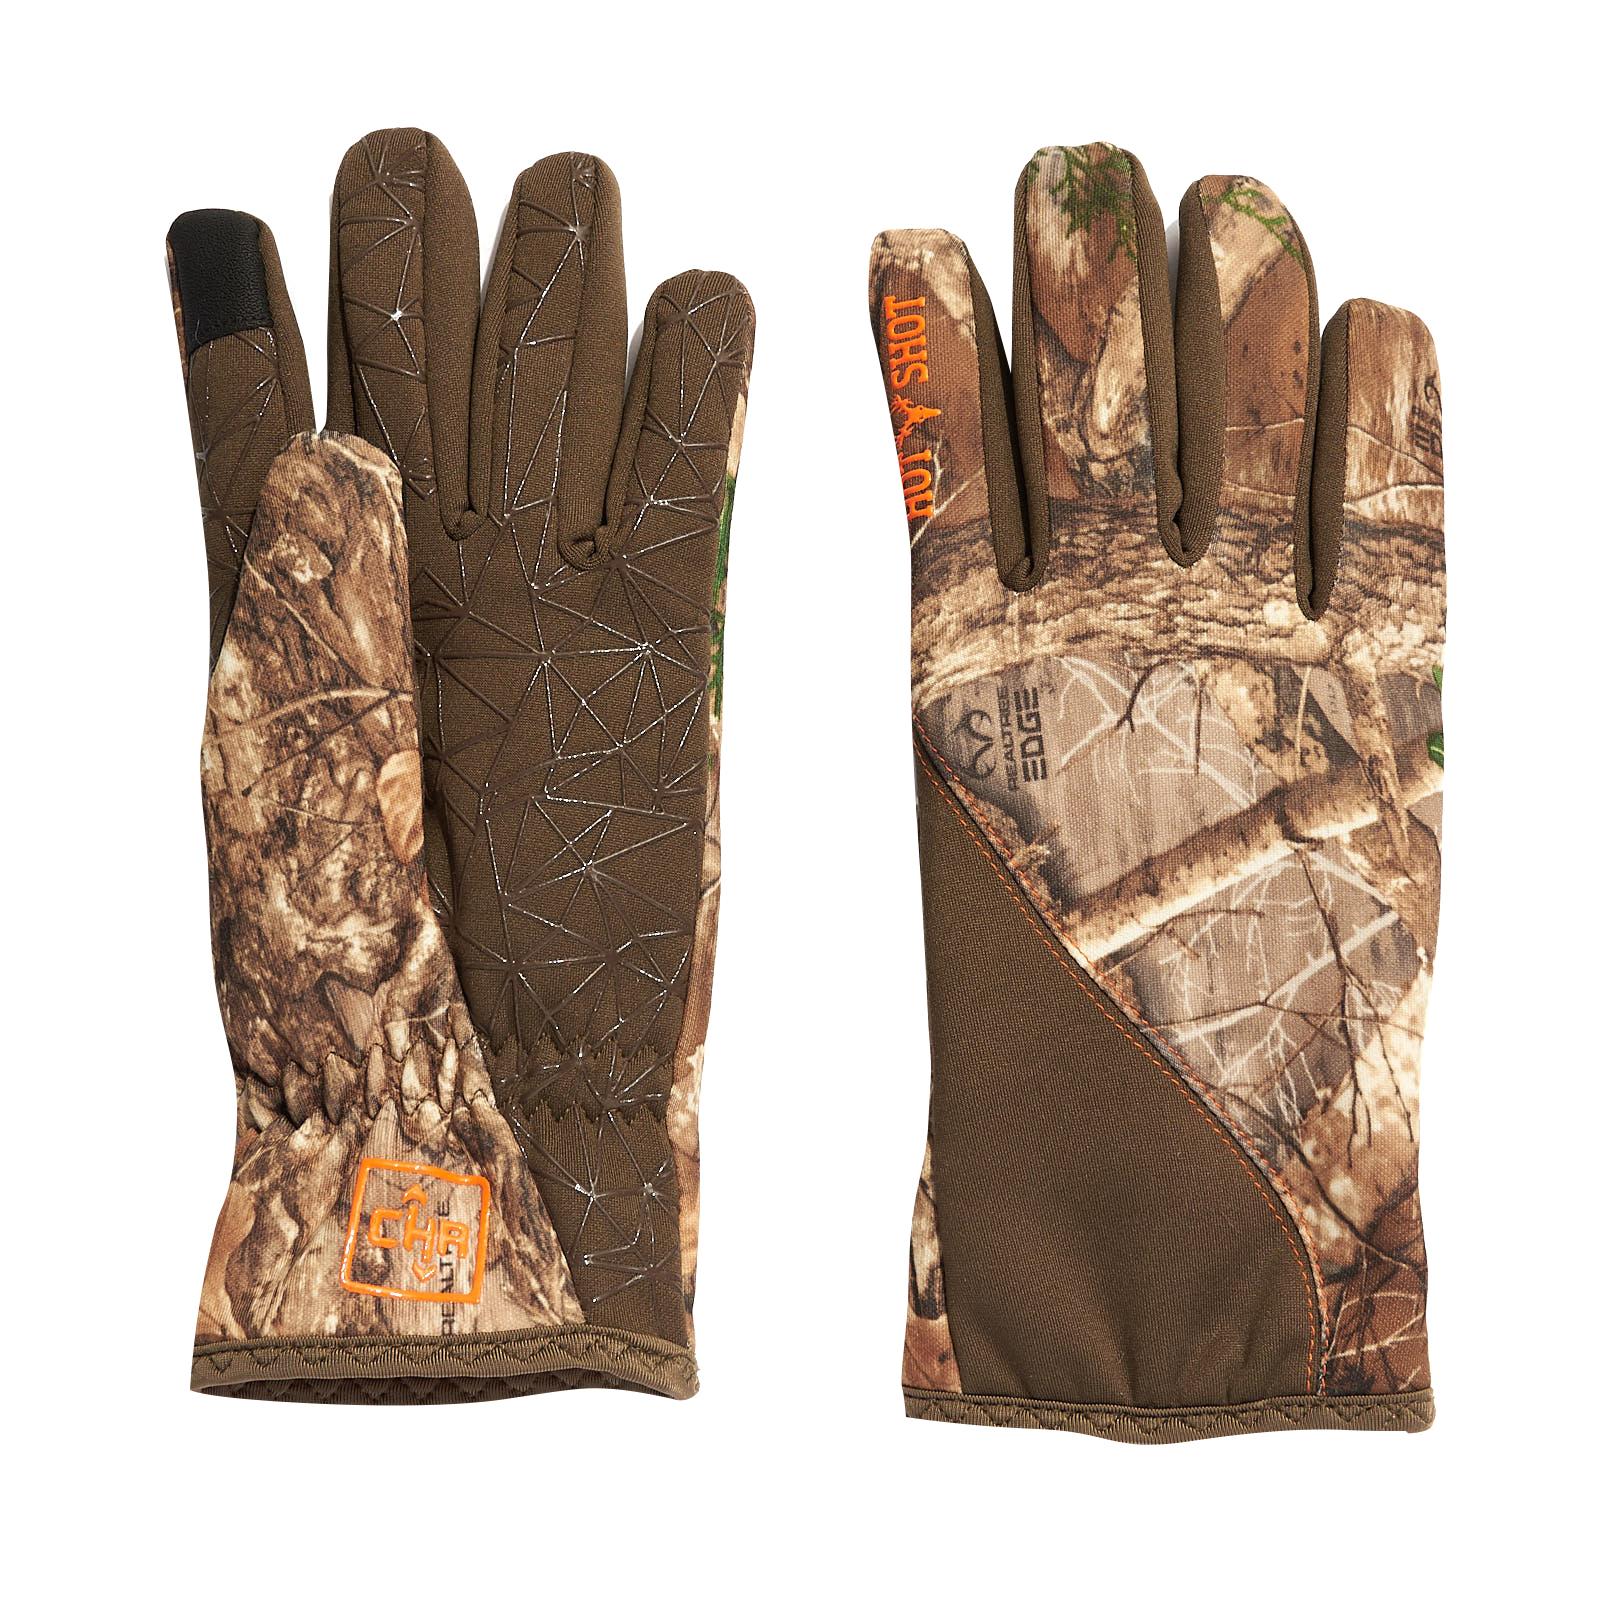 Hot Shot Women's Pathfinder ThermalCHR Touch Glove thumbnail